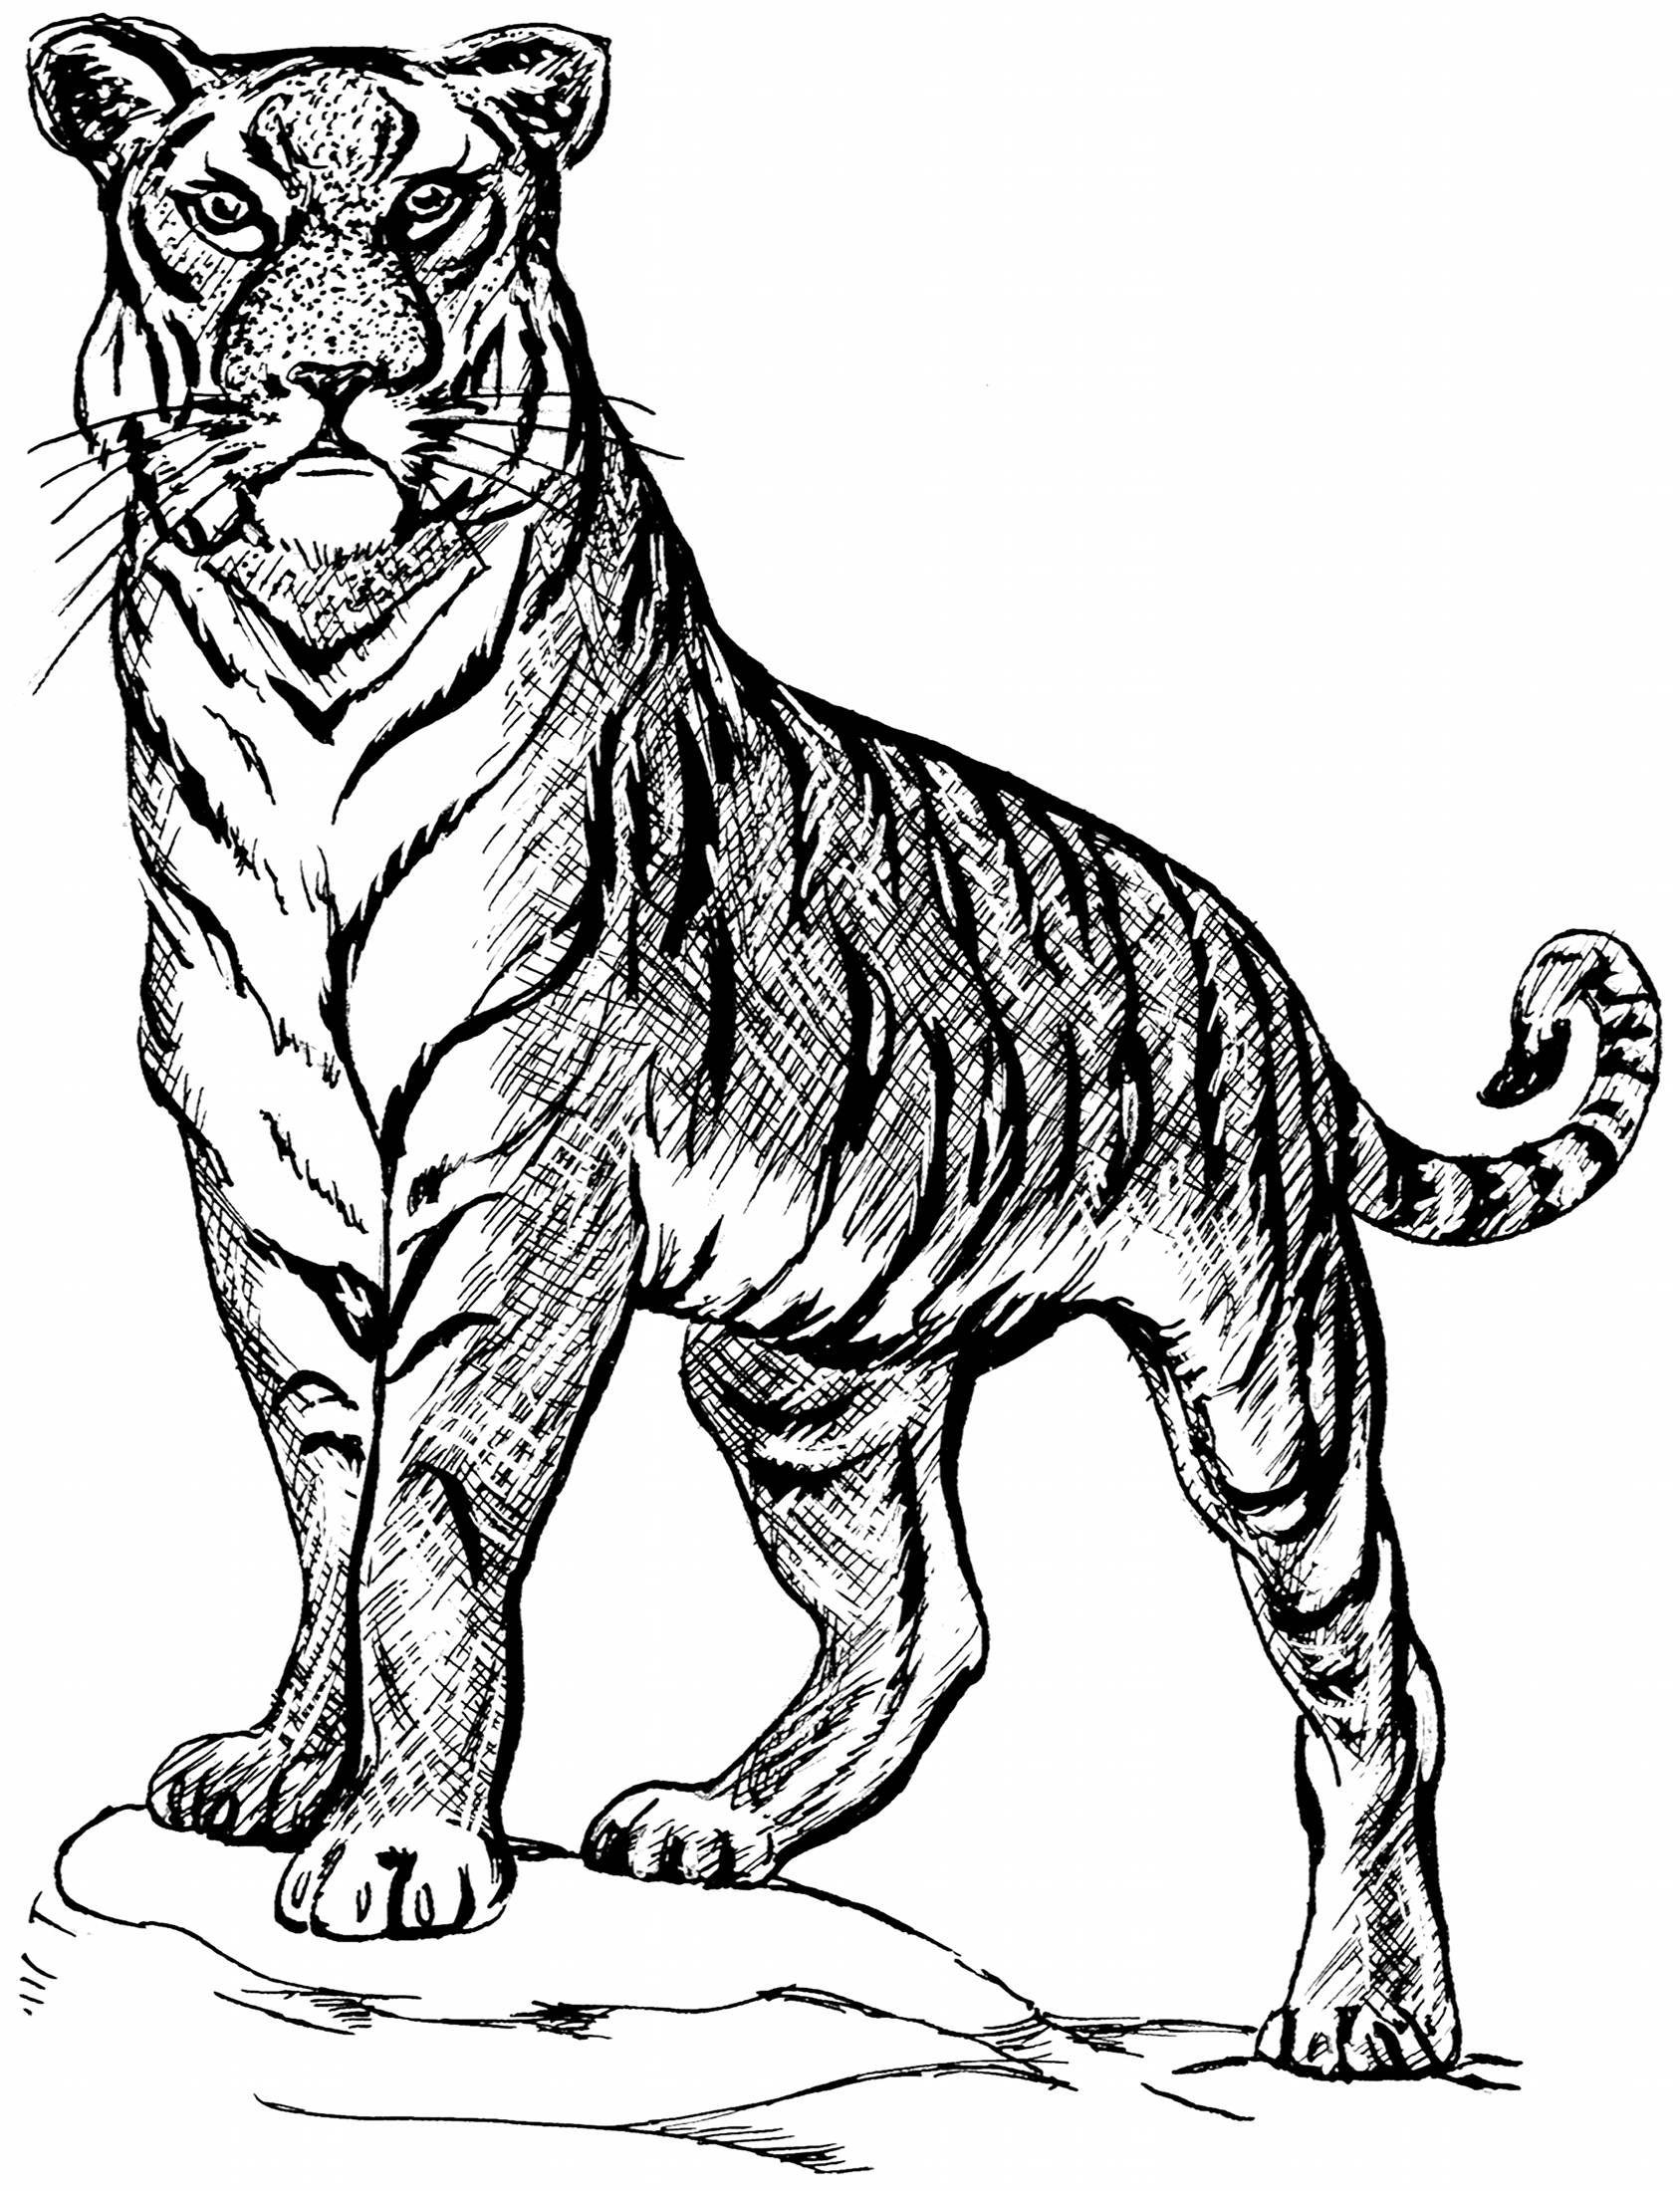 Afbeelding Van Http Www Felinest Com Images Line Drawing 1 Lg Jpg Tiger Illustration Tiger Drawing Animal Drawings